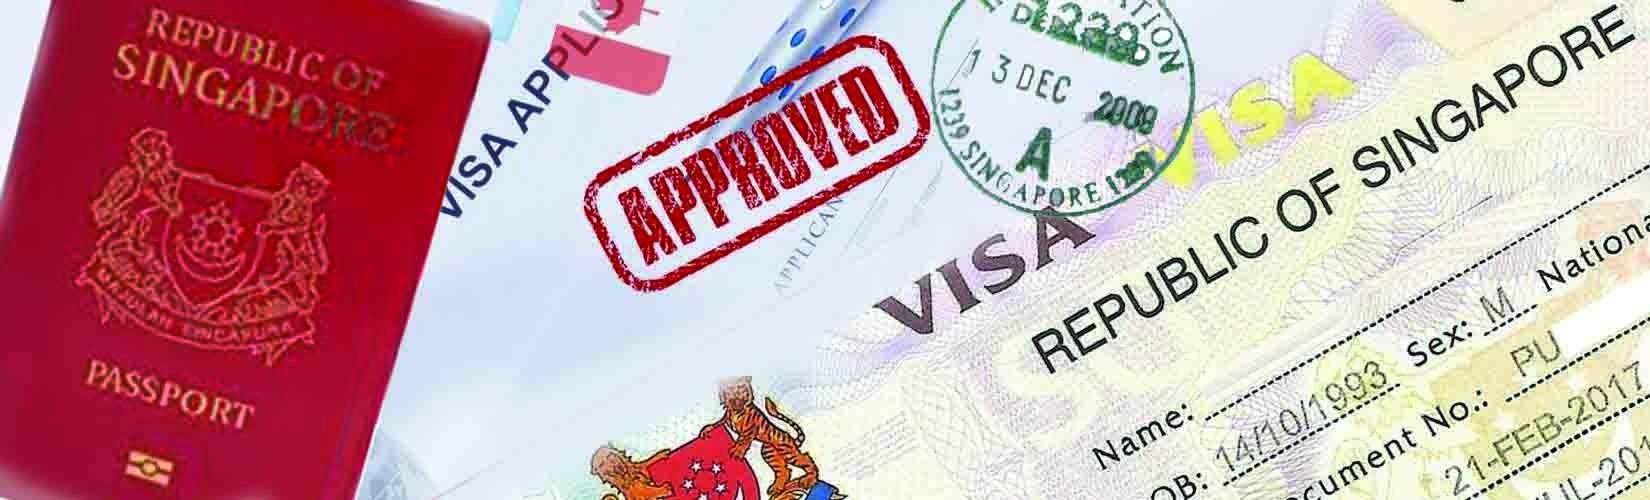 Singapore Travel Info: Complete Singapore Tourist Visa Information